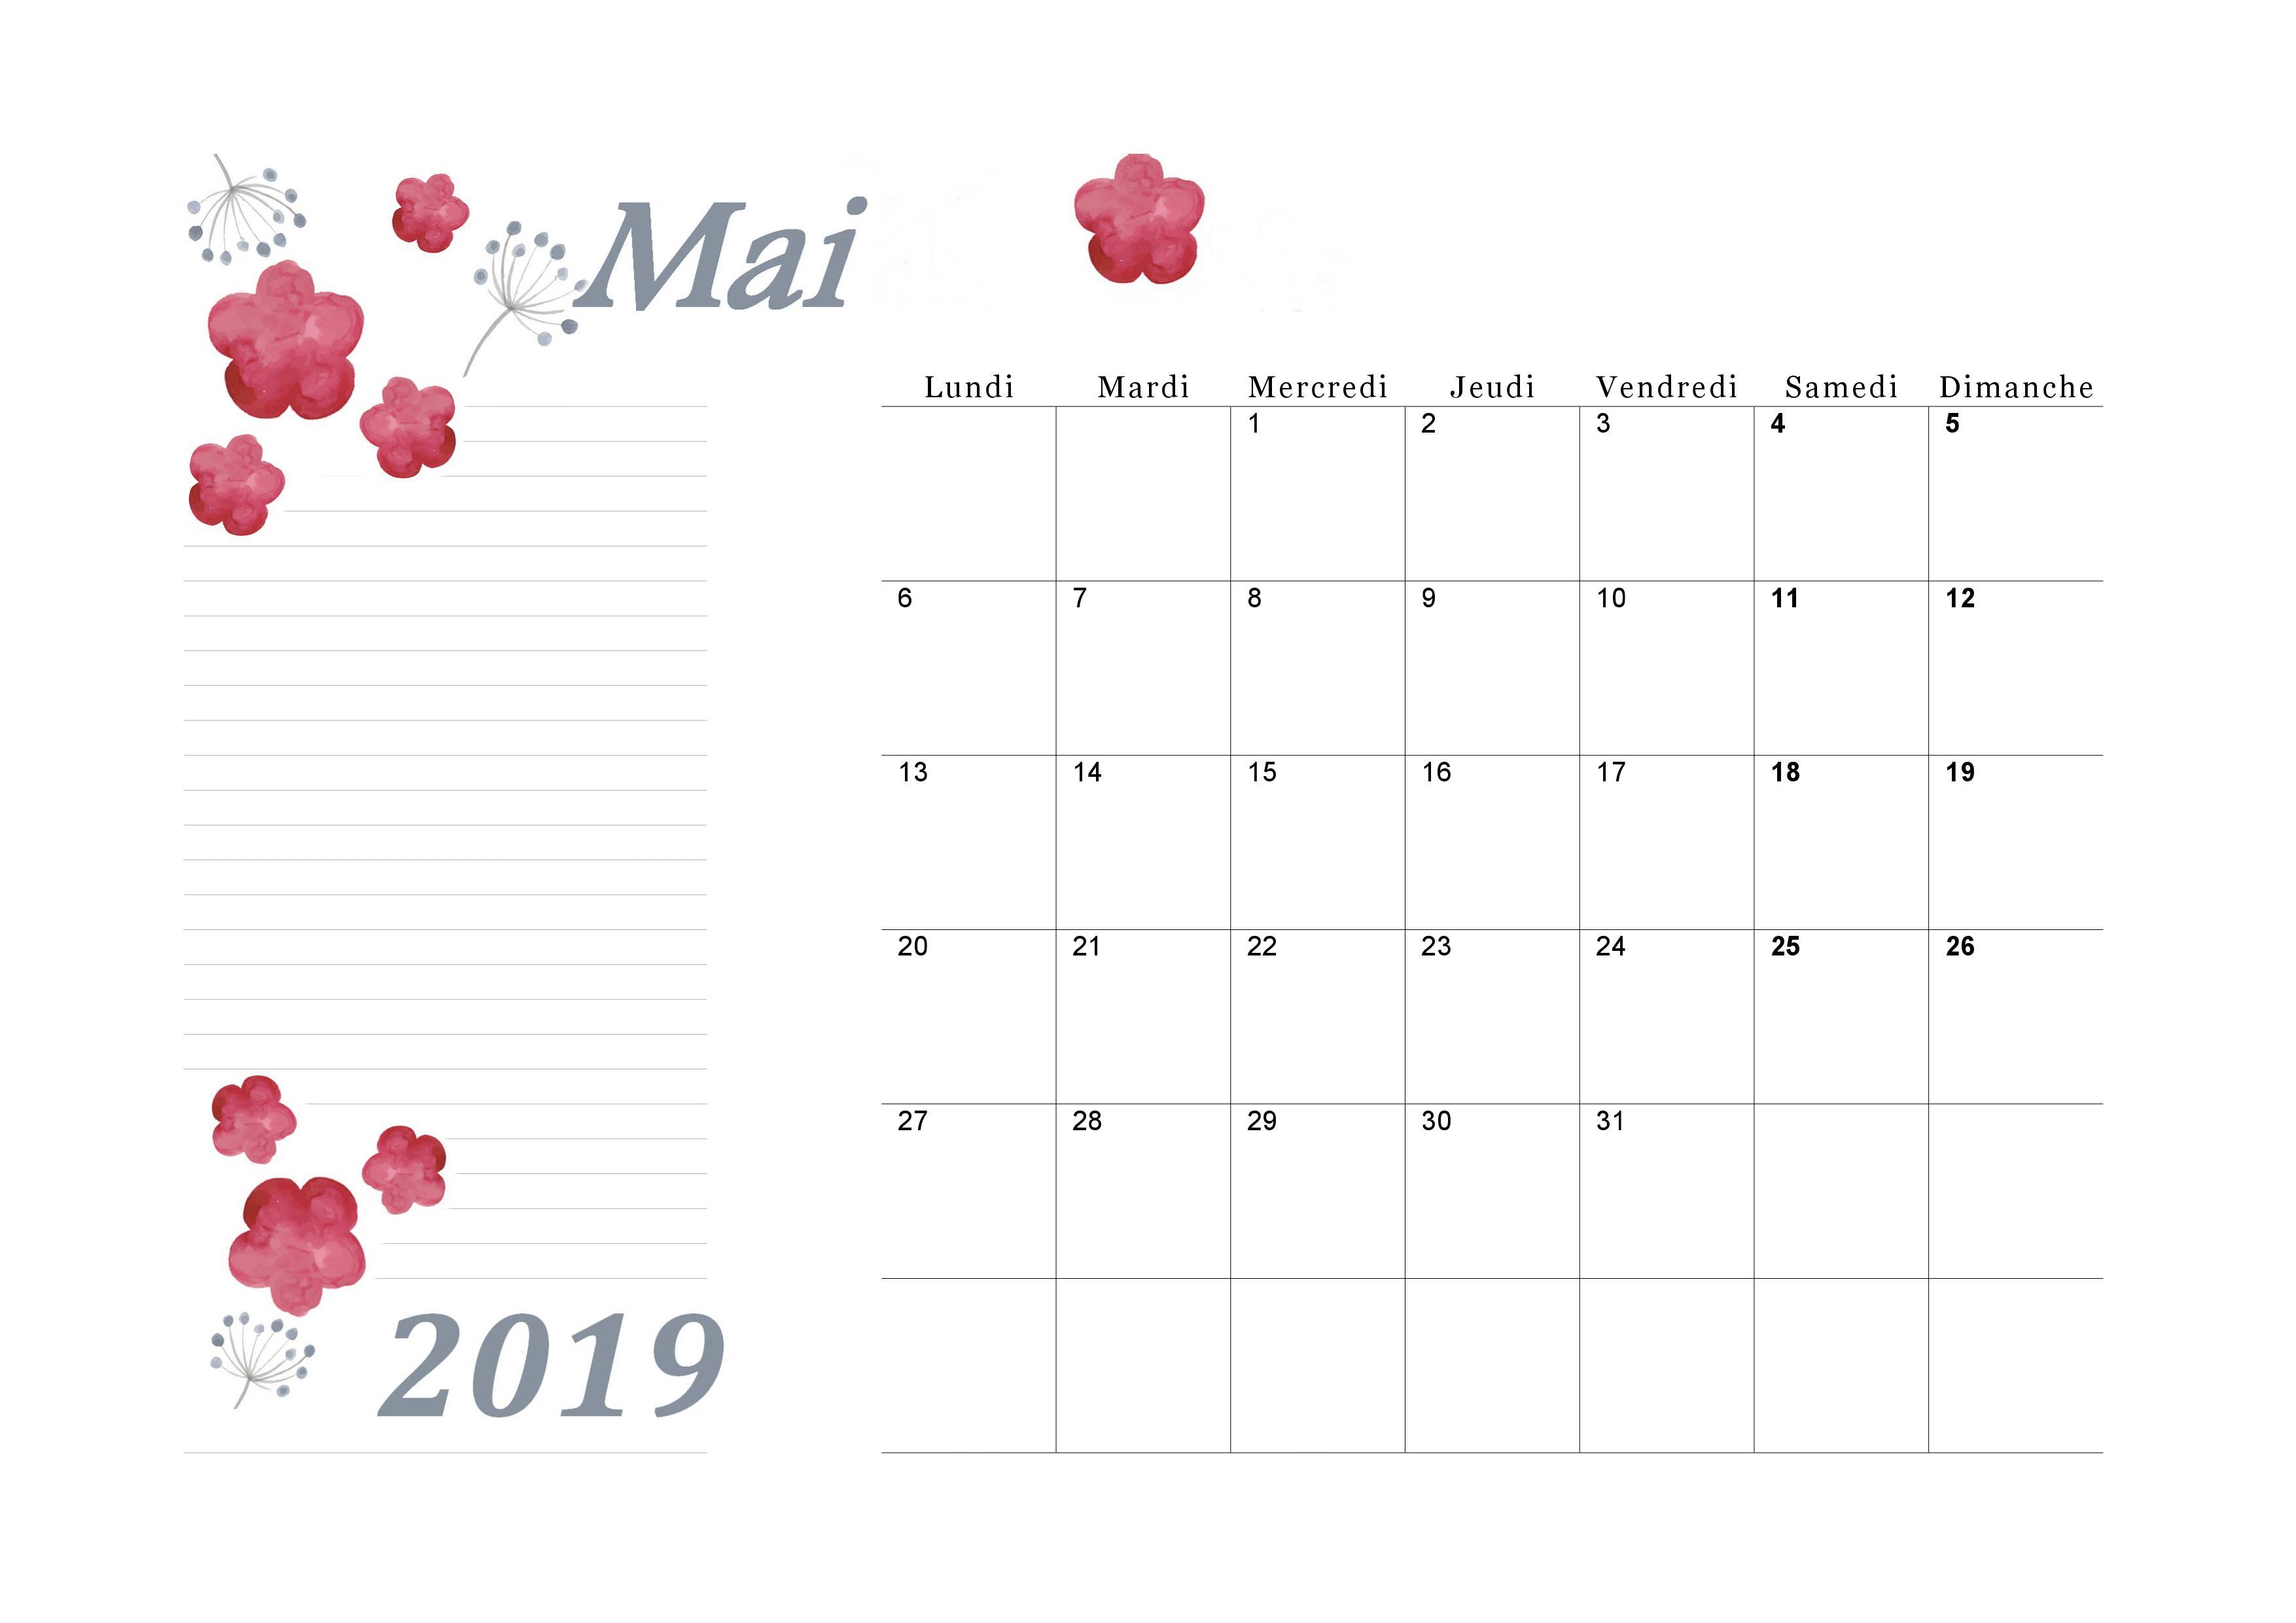 Calendrier Mai2019.Calendrier Mai 2019 A Imprimer Calendriers Imprimables En